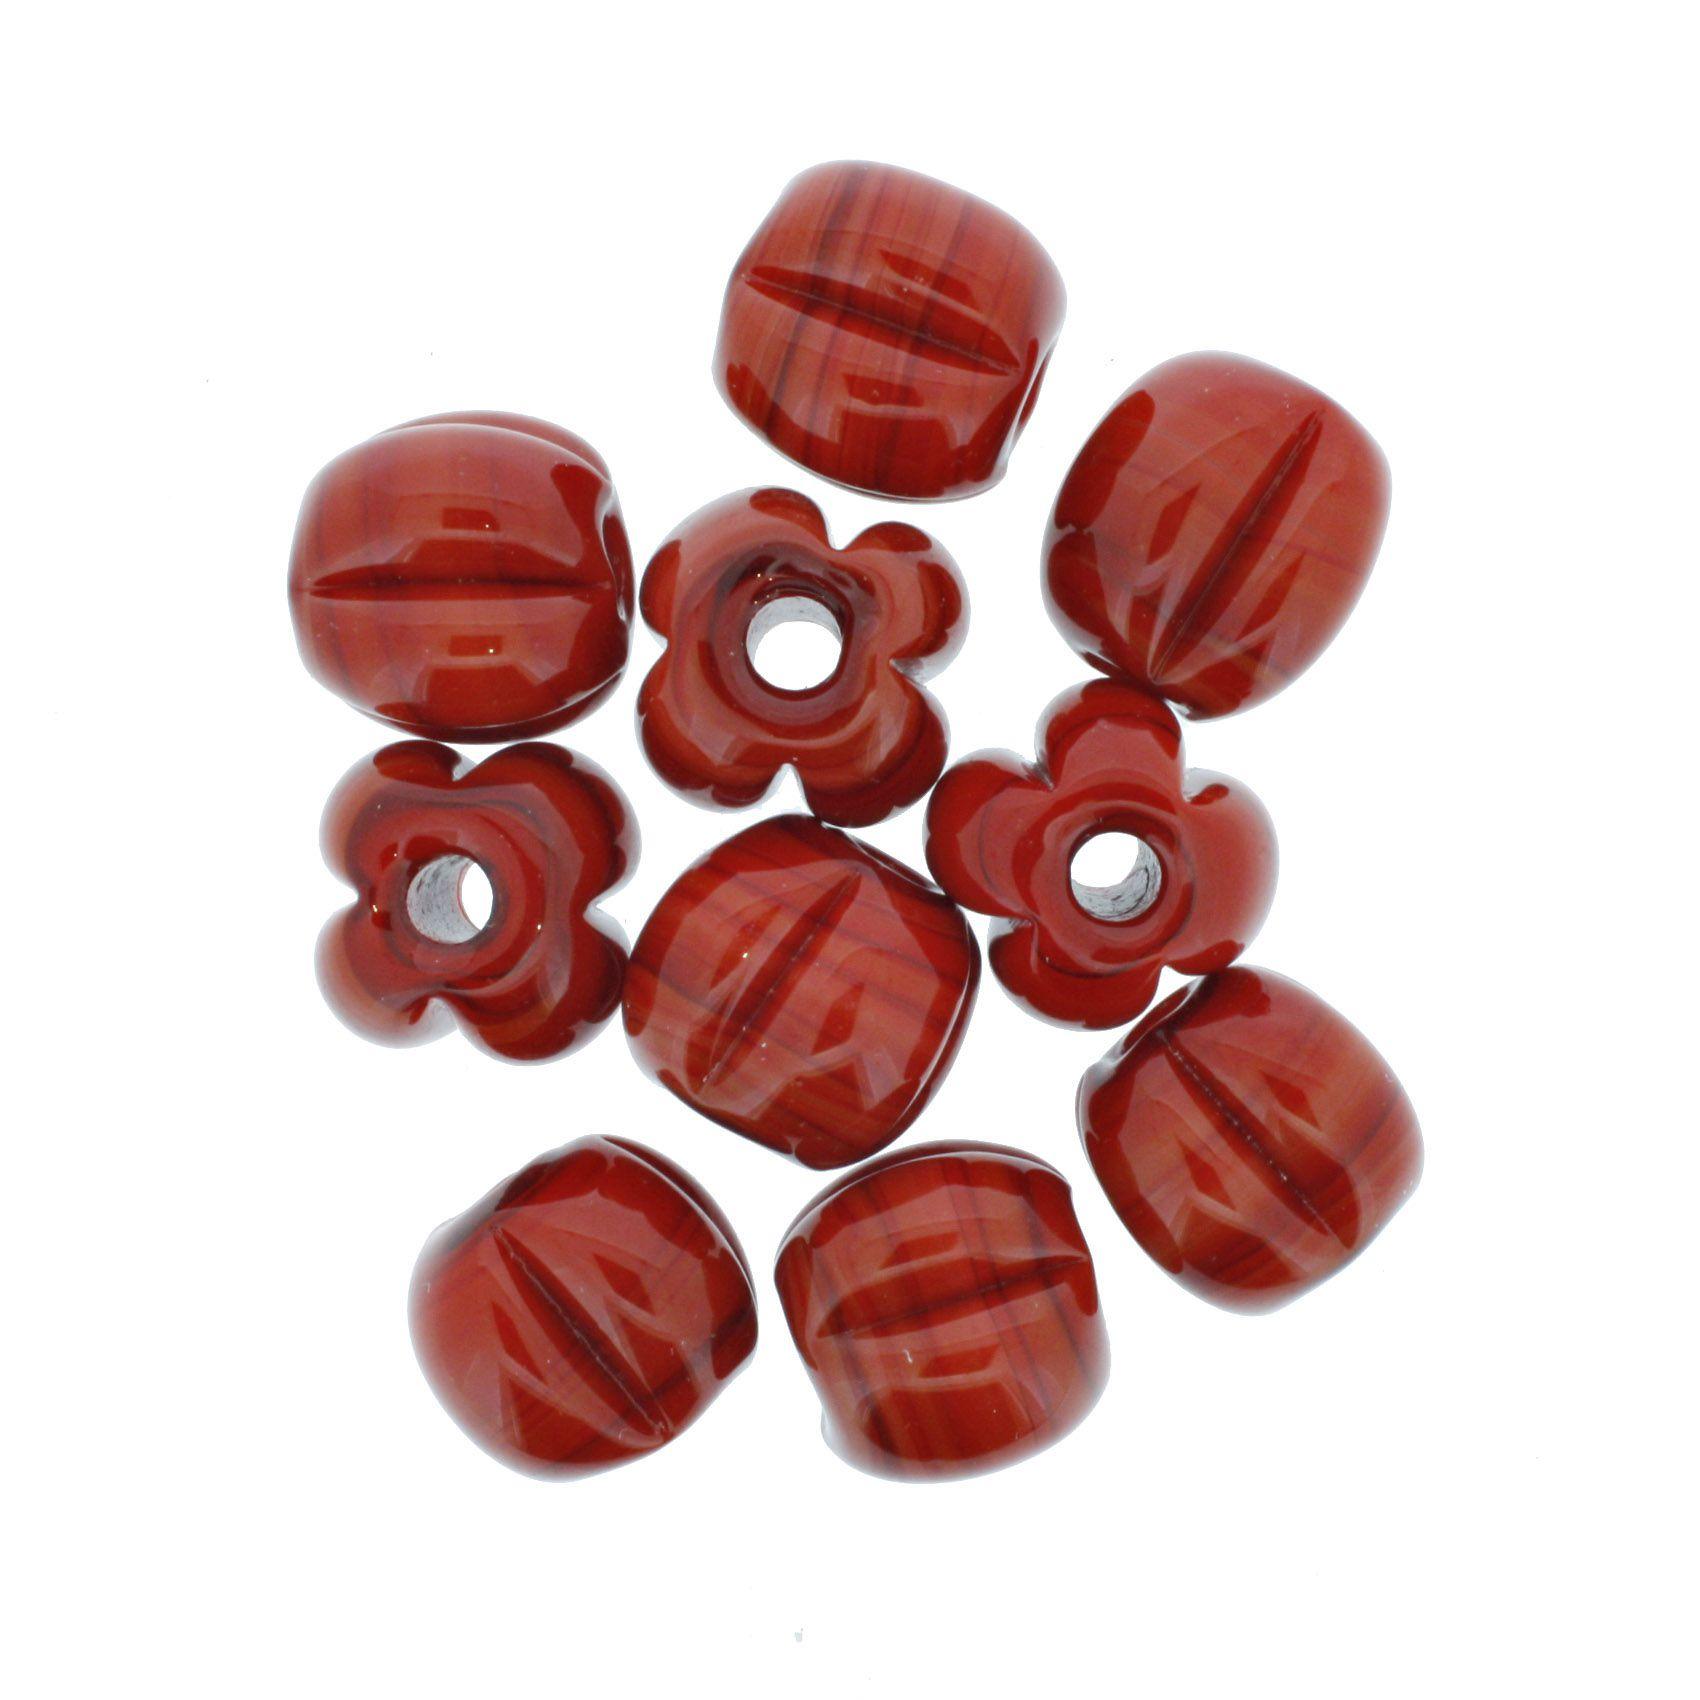 Firma Pitanga - Vermelha  - Stéphanie Bijoux® - Peças para Bijuterias e Artesanato